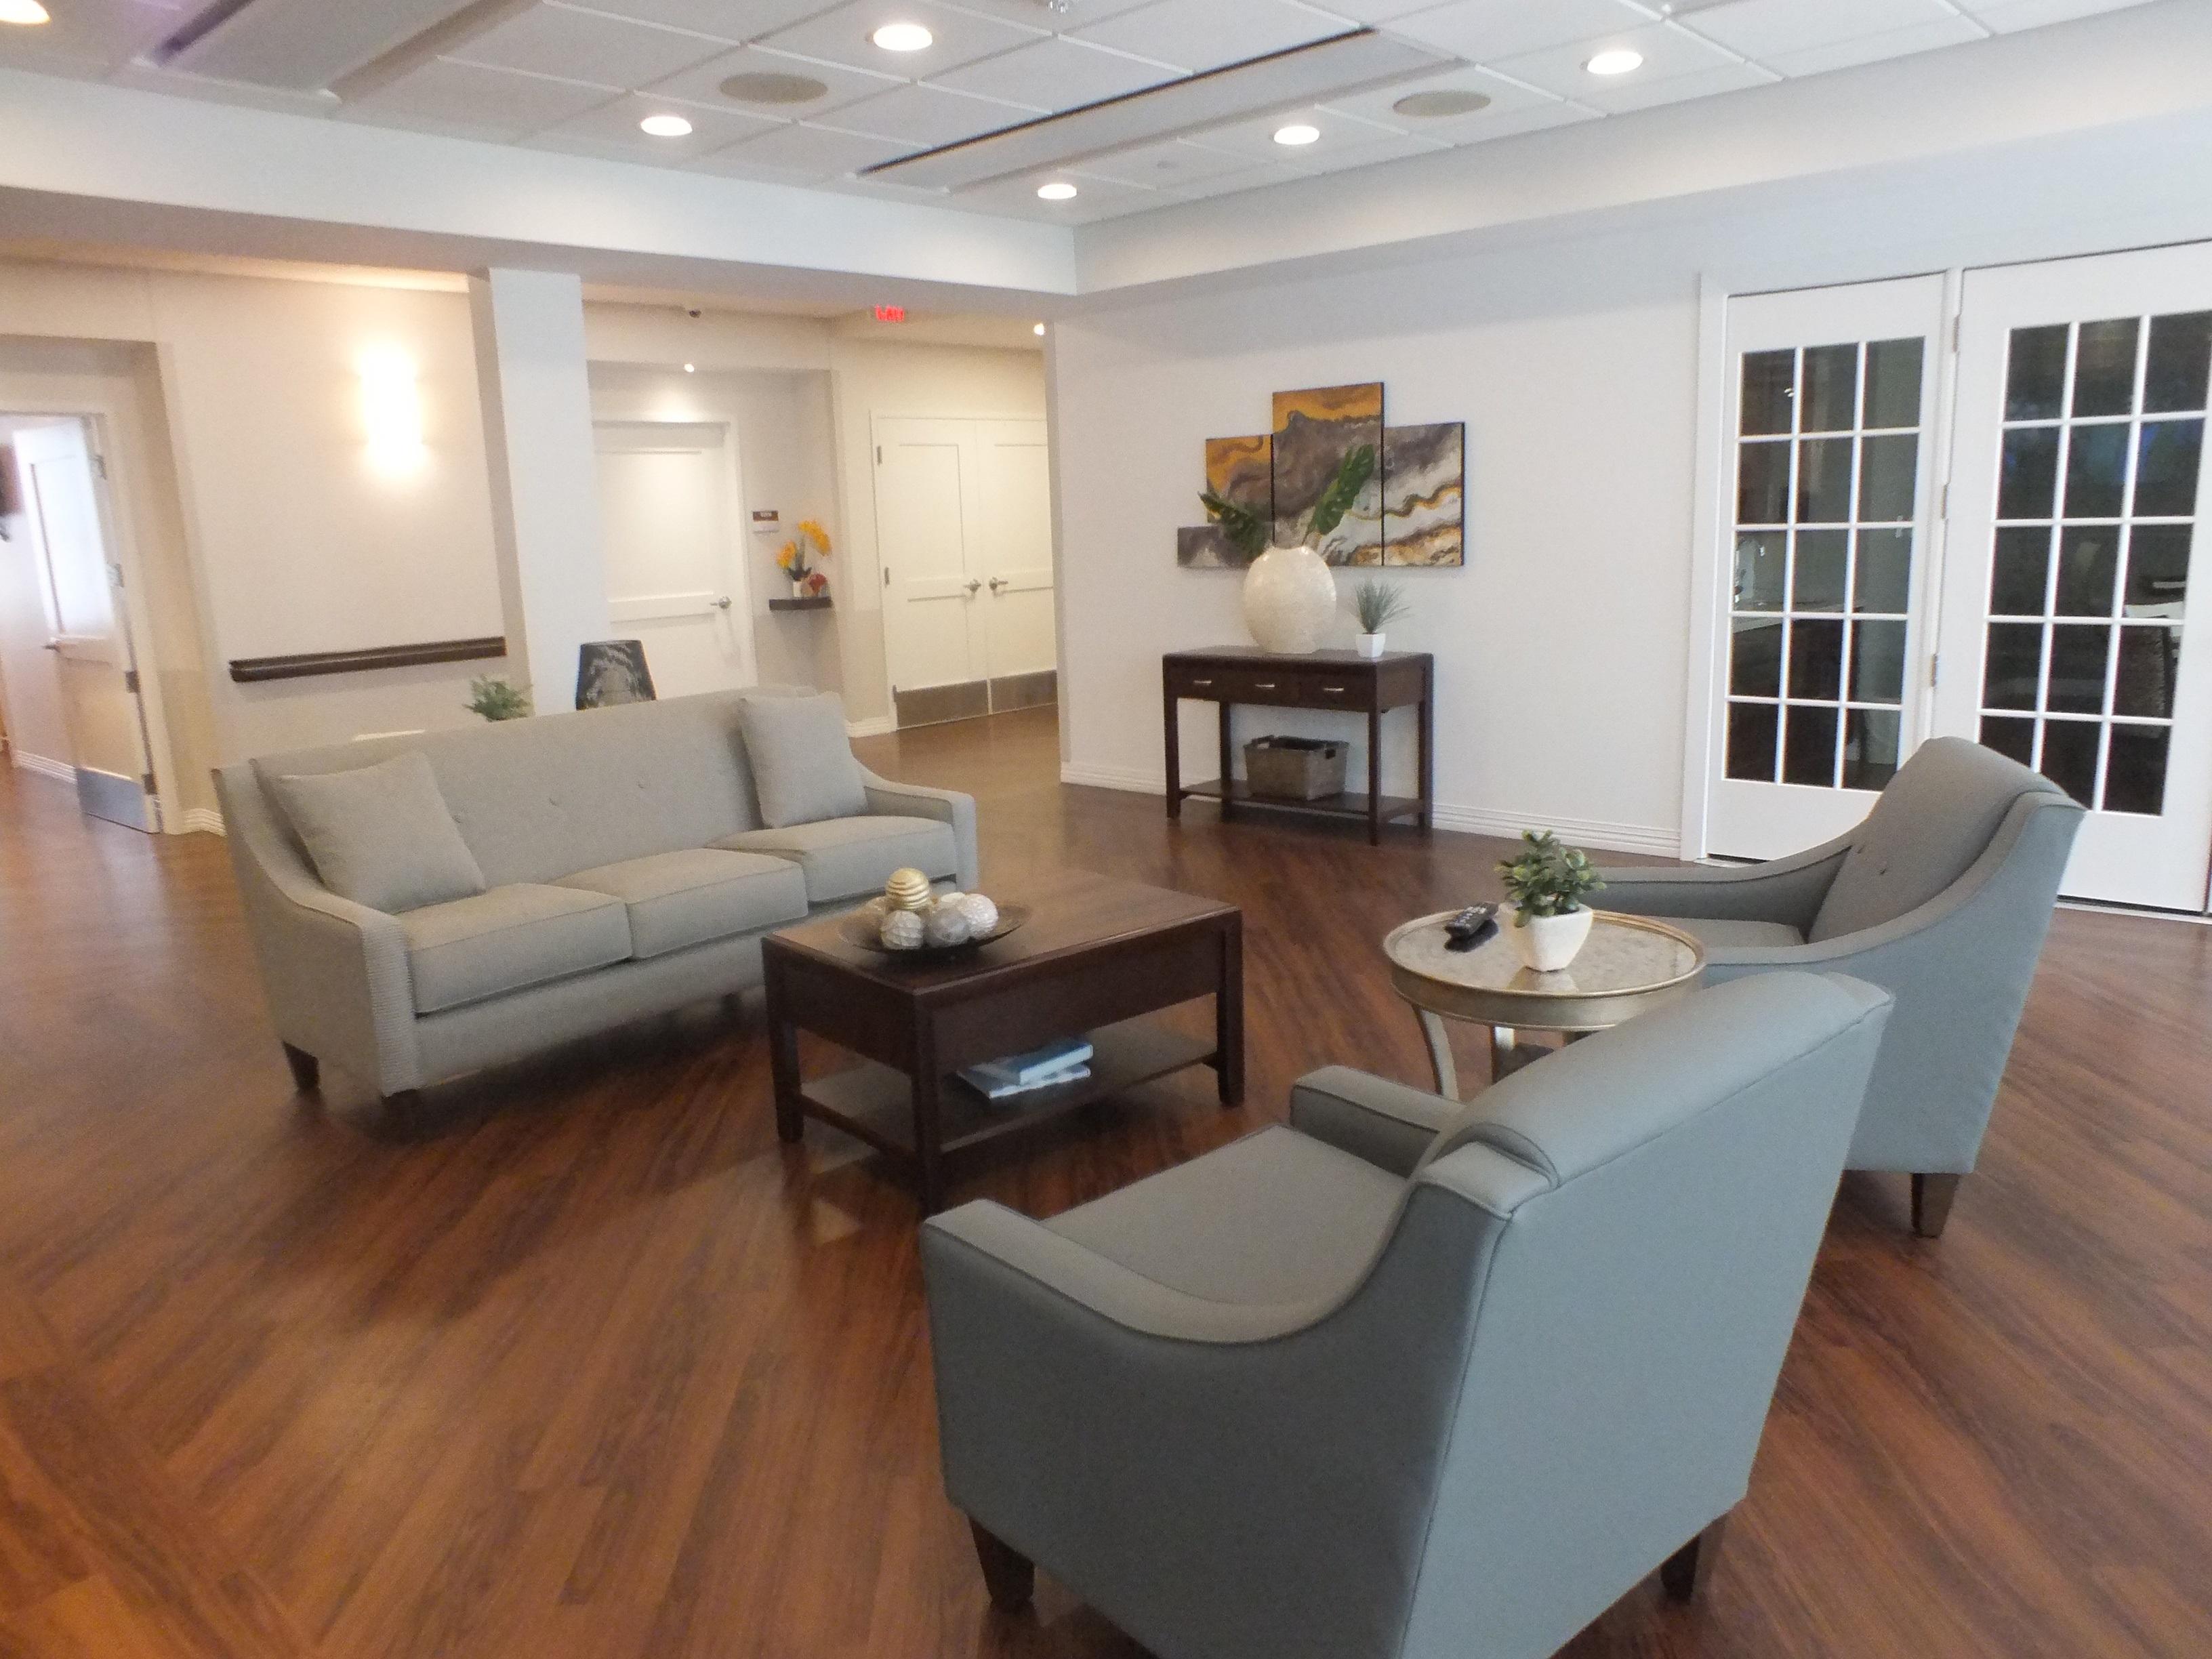 SNRC Lounge area 3